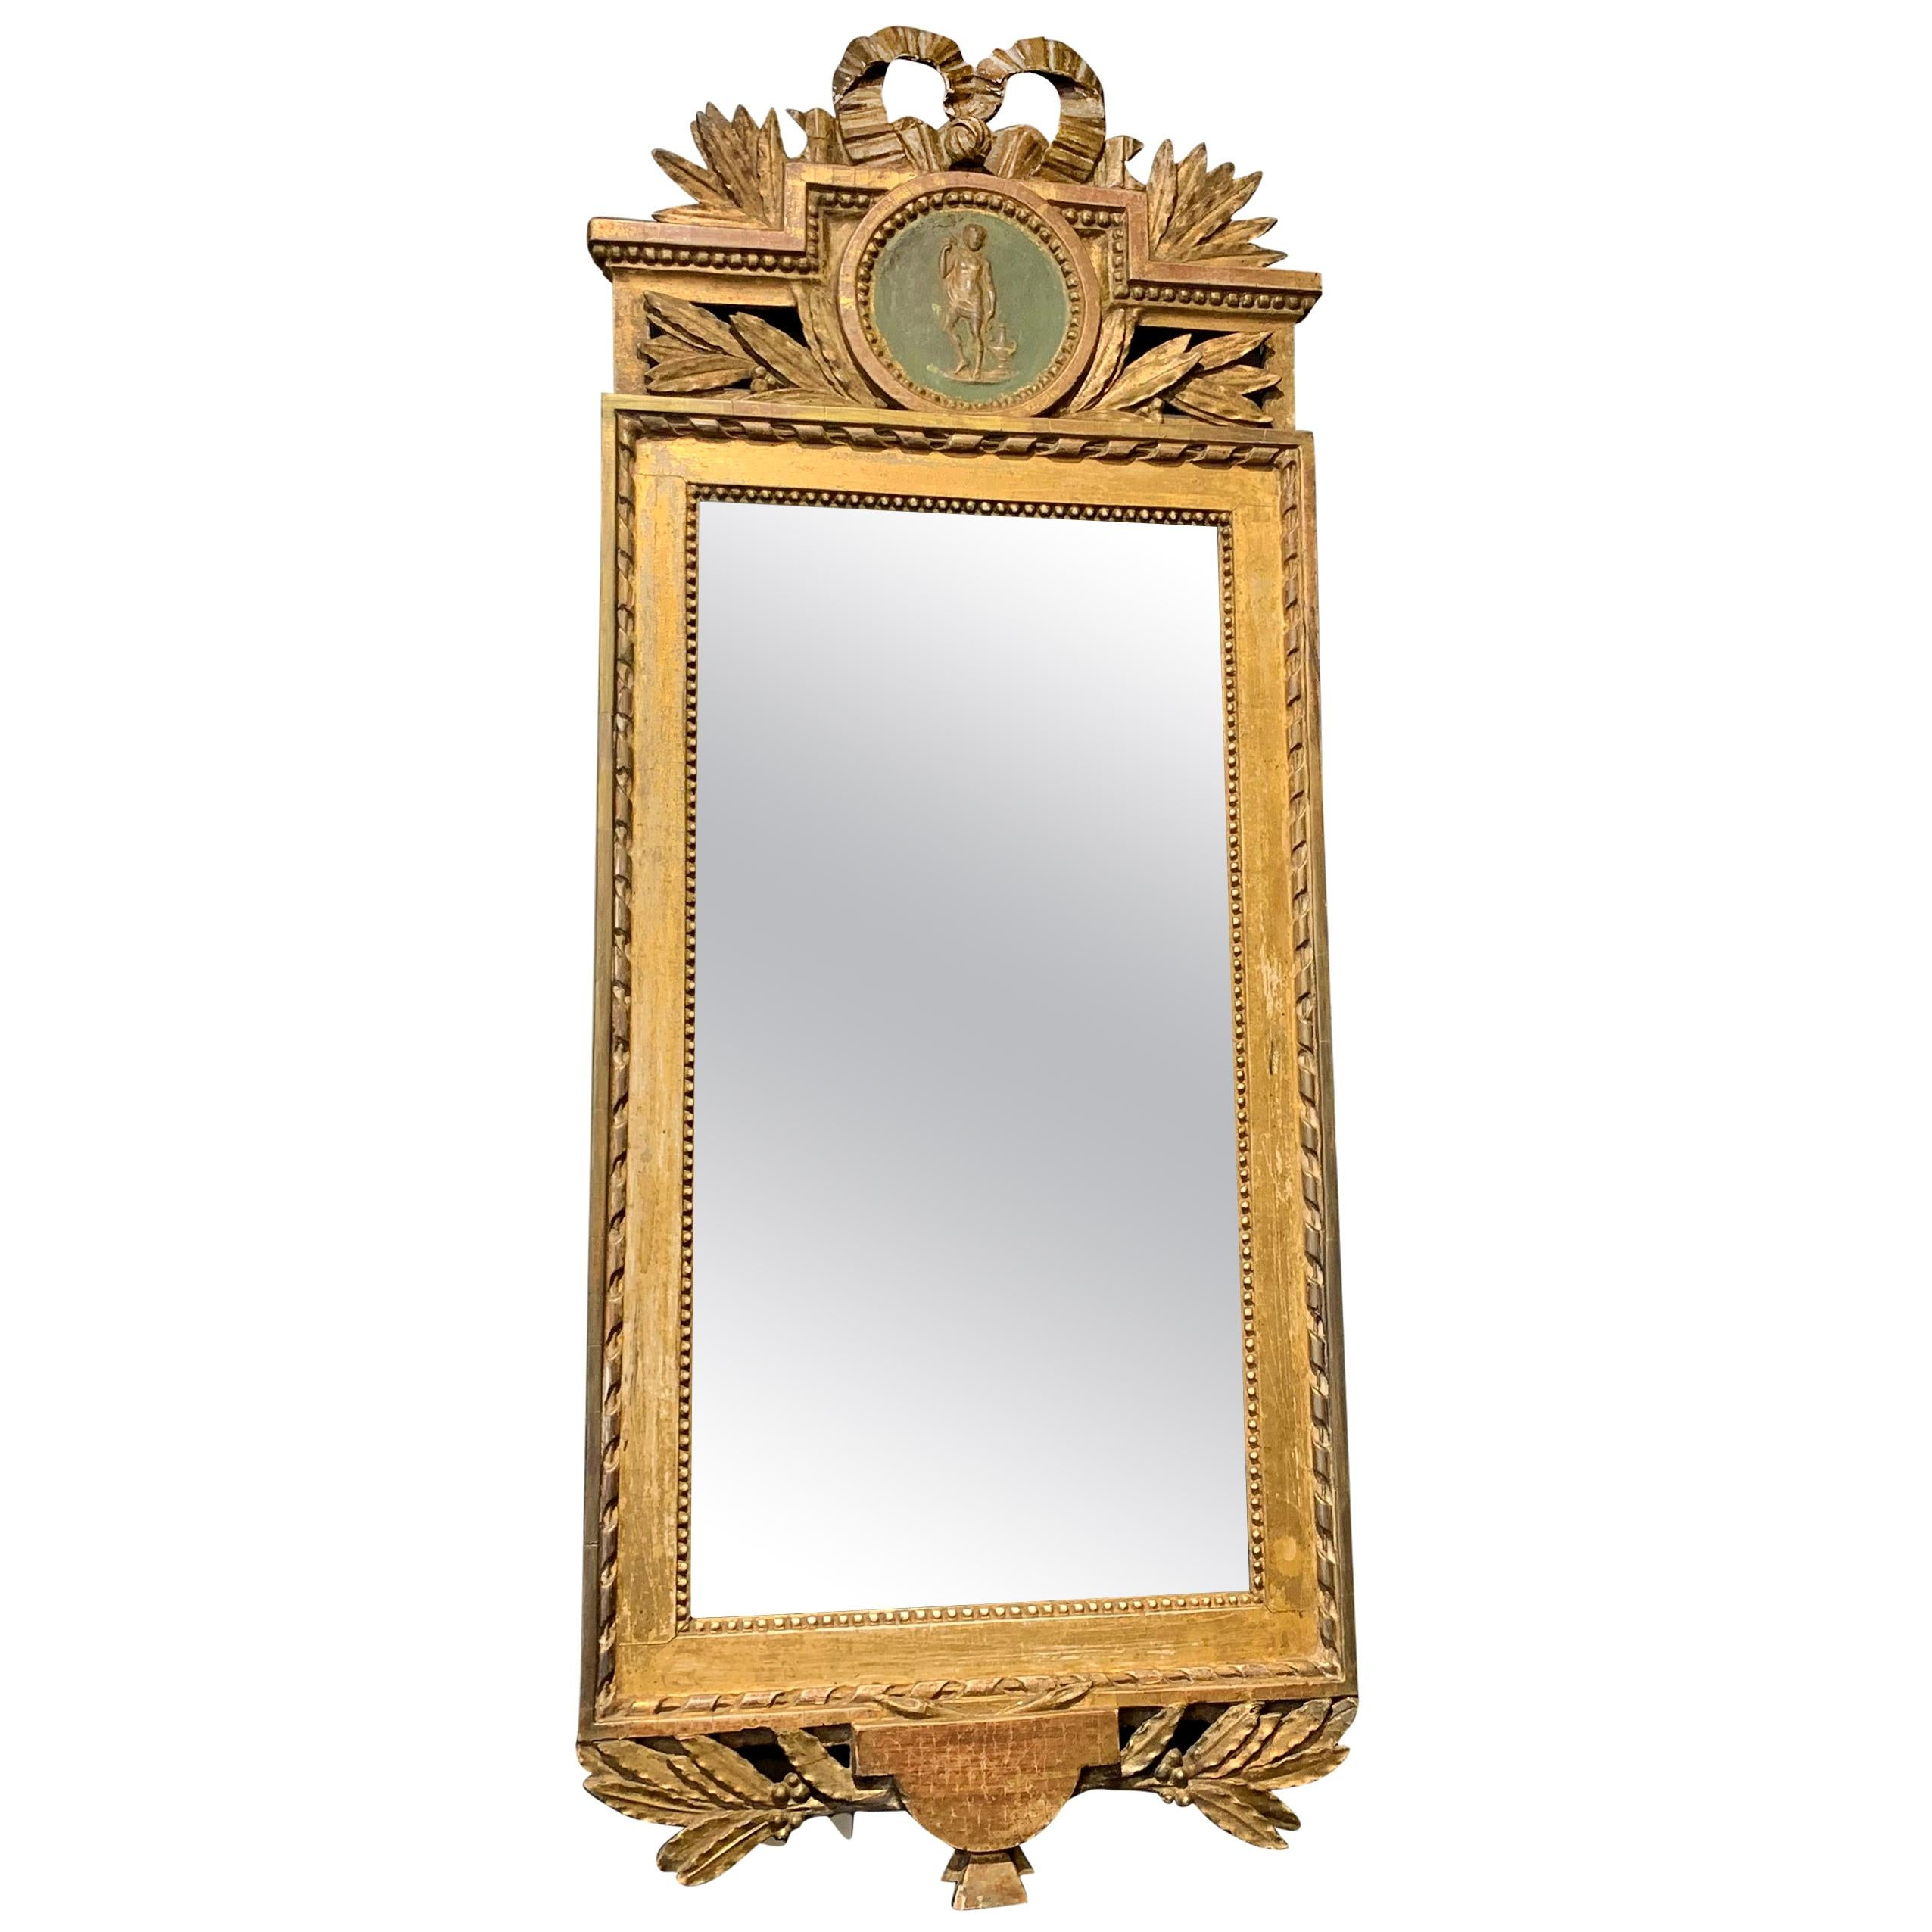 18th Century Swedish Gustavian Wall Mirror